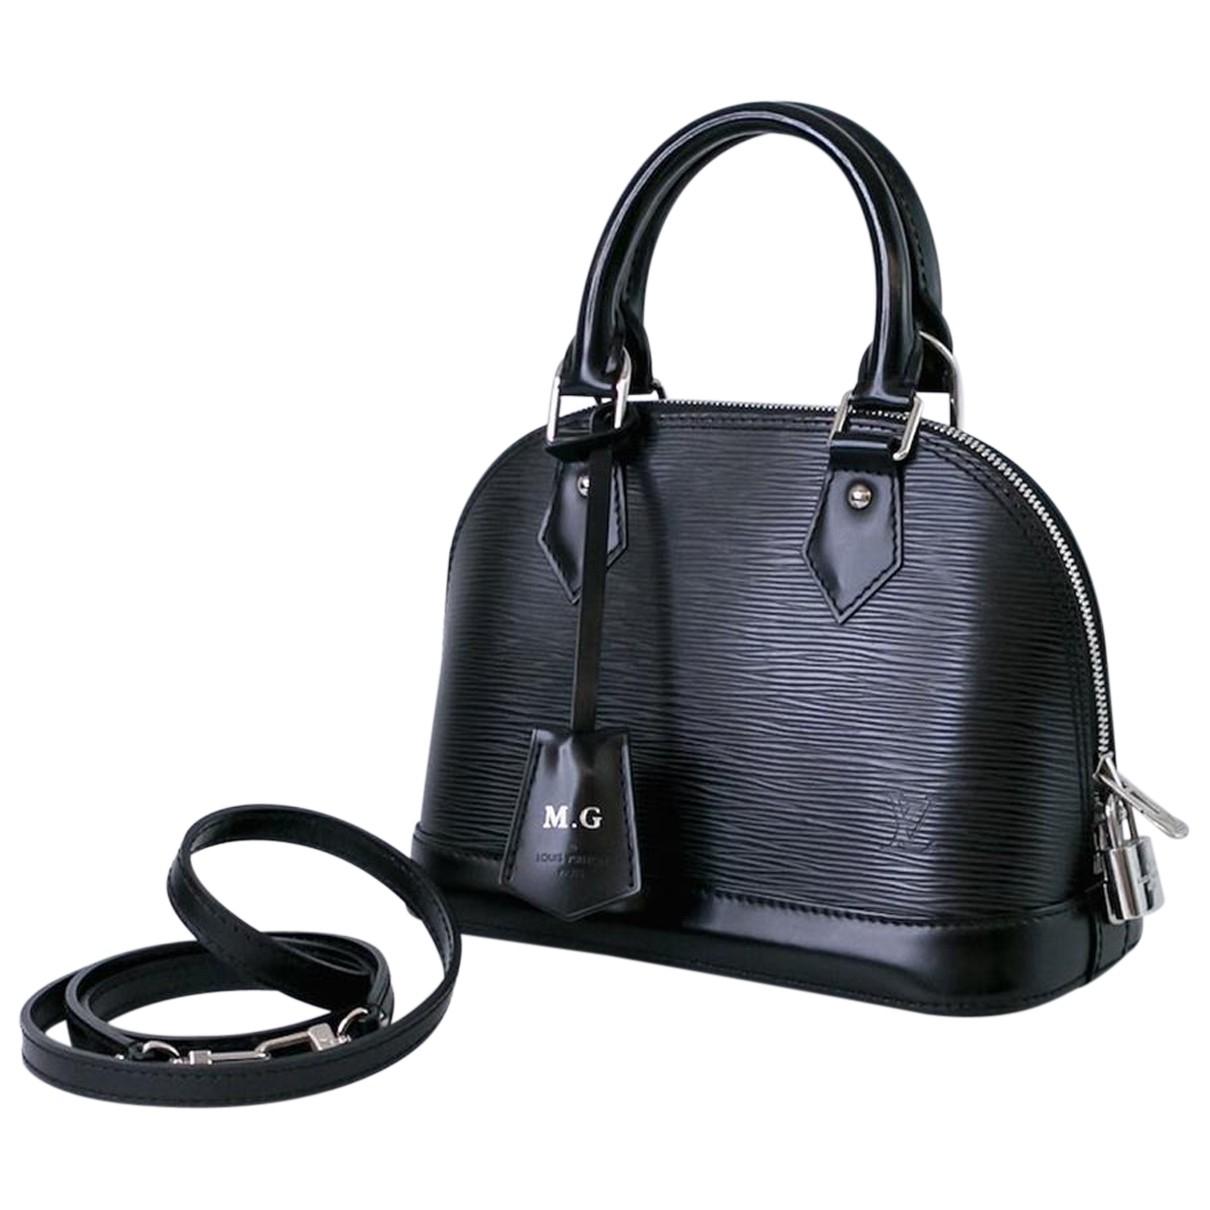 Louis Vuitton - Sac a main Alma BB pour femme en cuir - noir